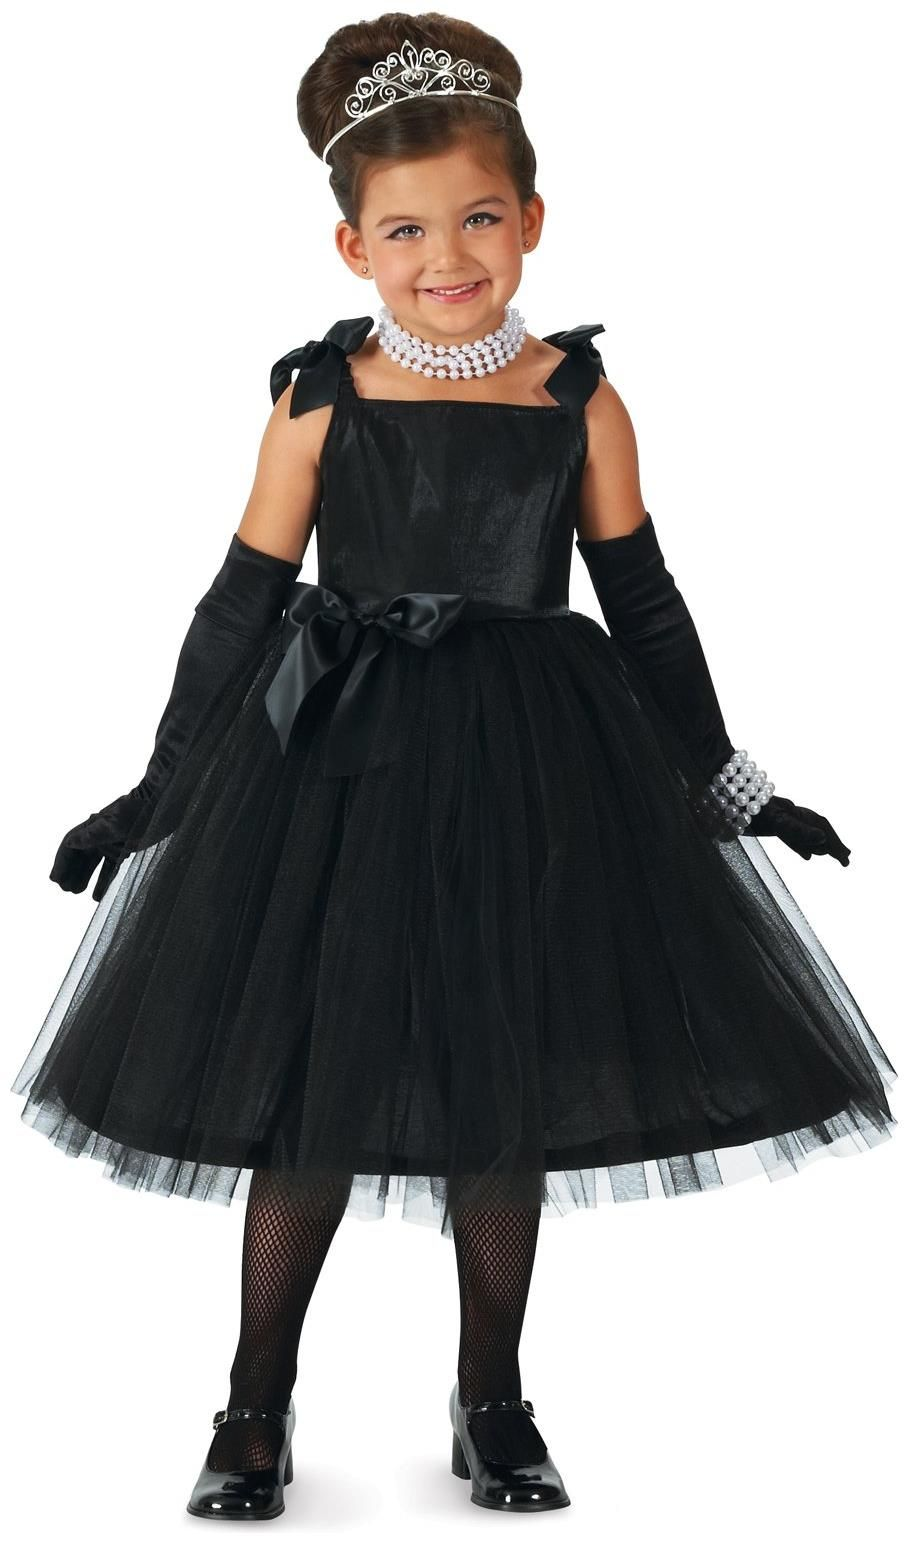 Movie Star Girls Dress Kids Costumes Accessories Costumes